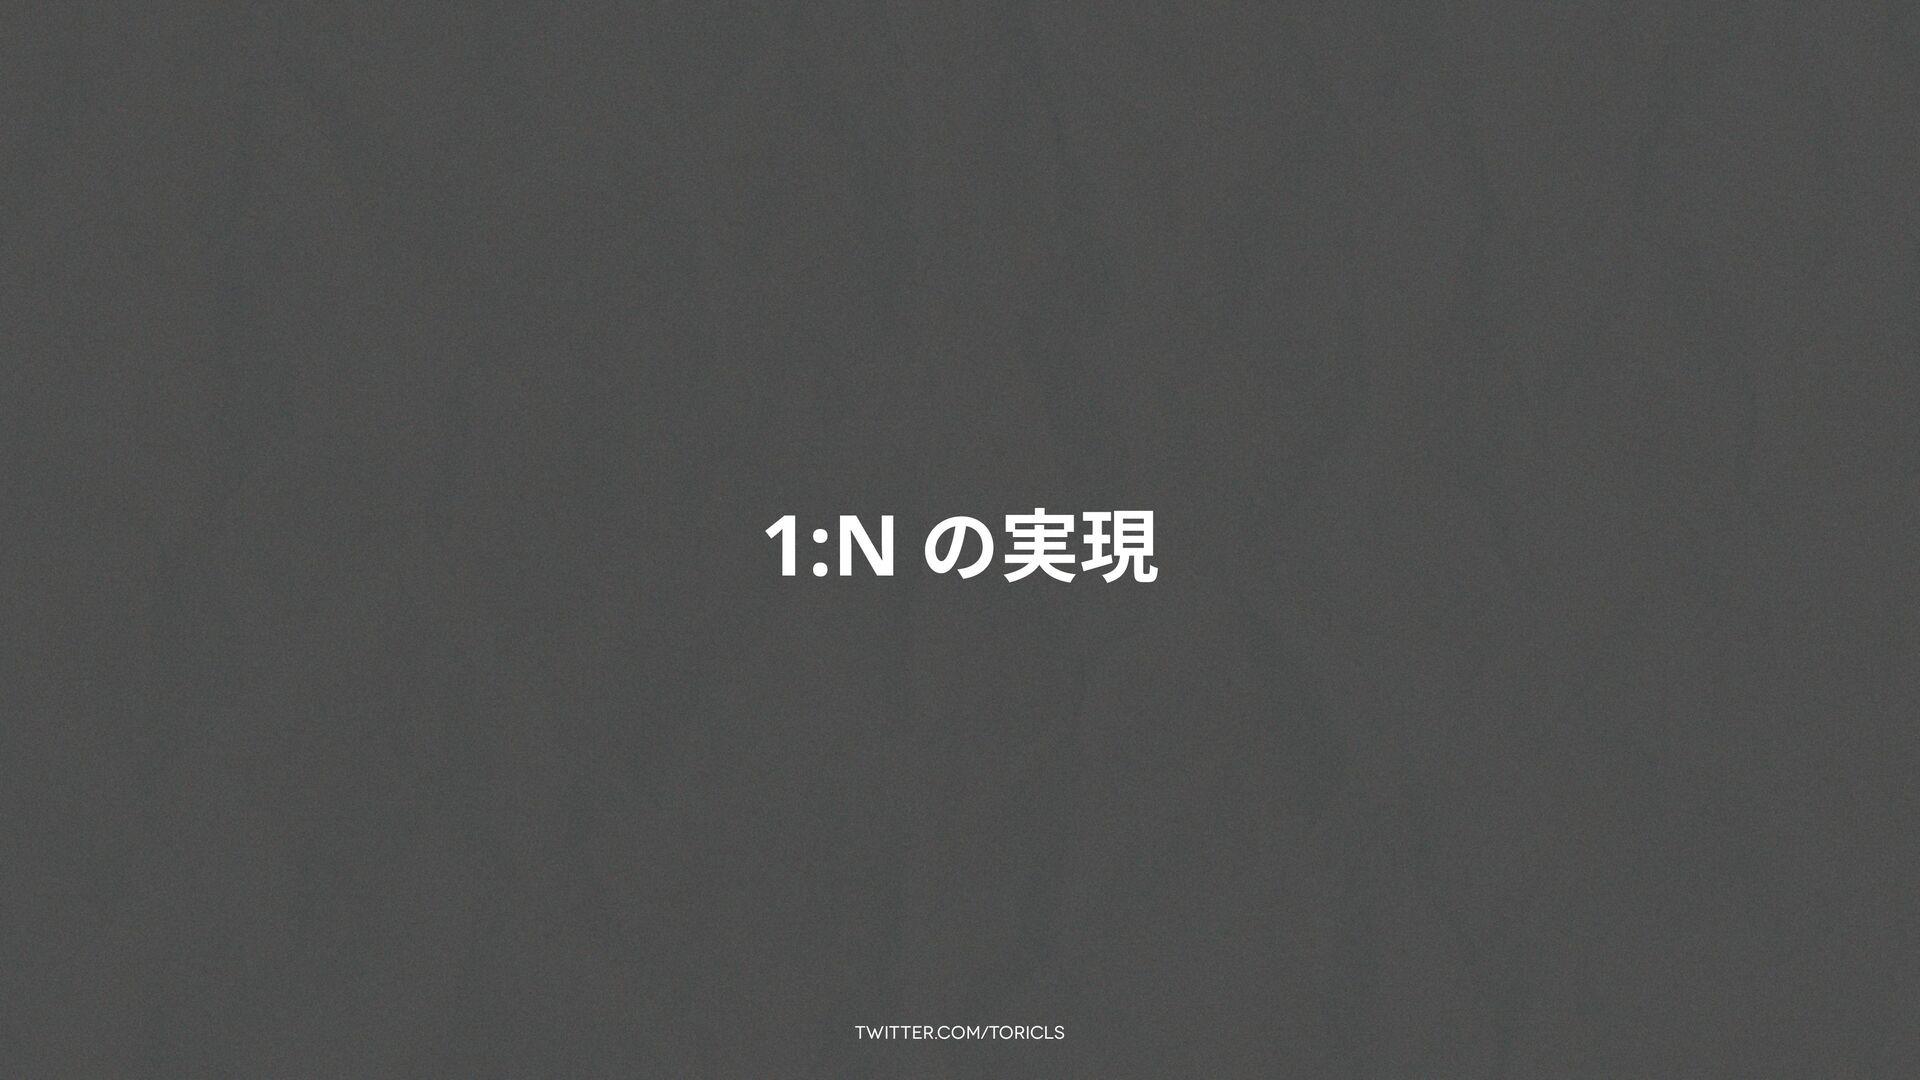 twitter.com/toricls 1:N の実現